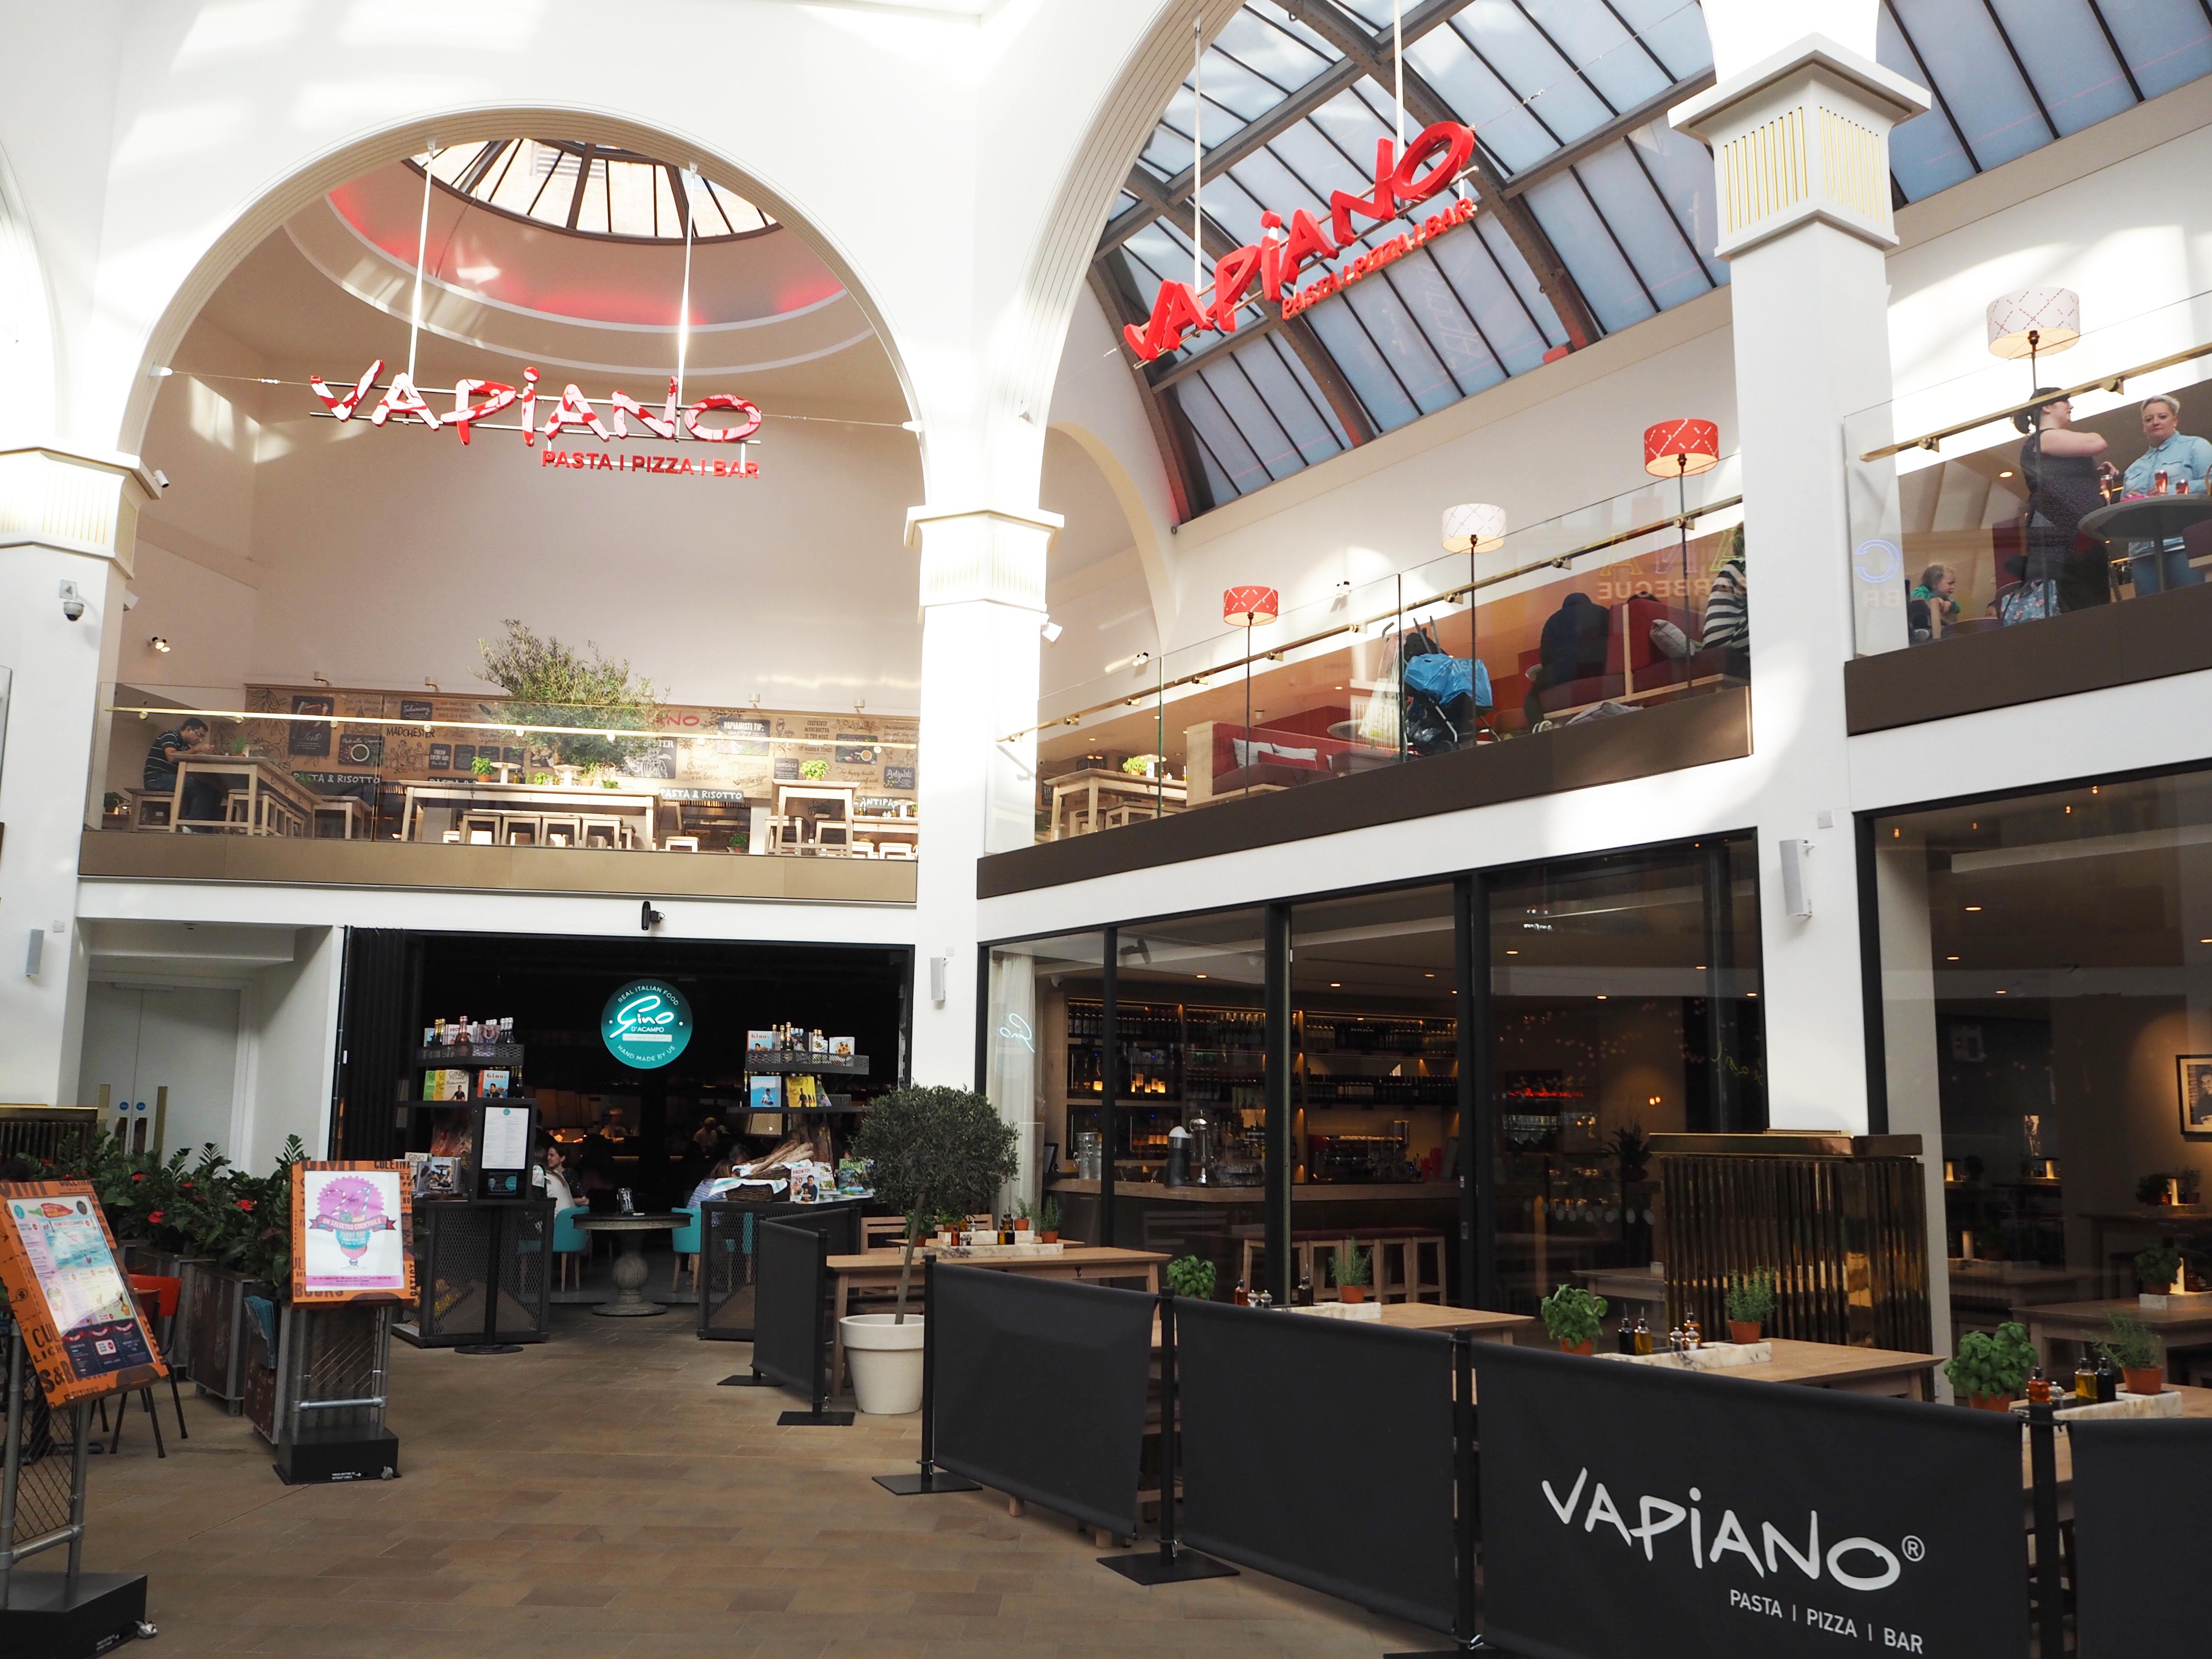 Vapiano UK new cocktail menu launch - Manchester event & review